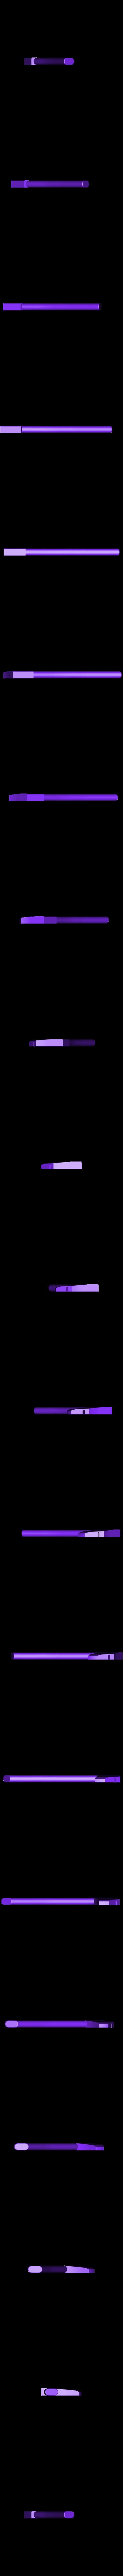 axepinv1.stl Download free STL file Axe Pin! • 3D printer design, wildrosebuilds